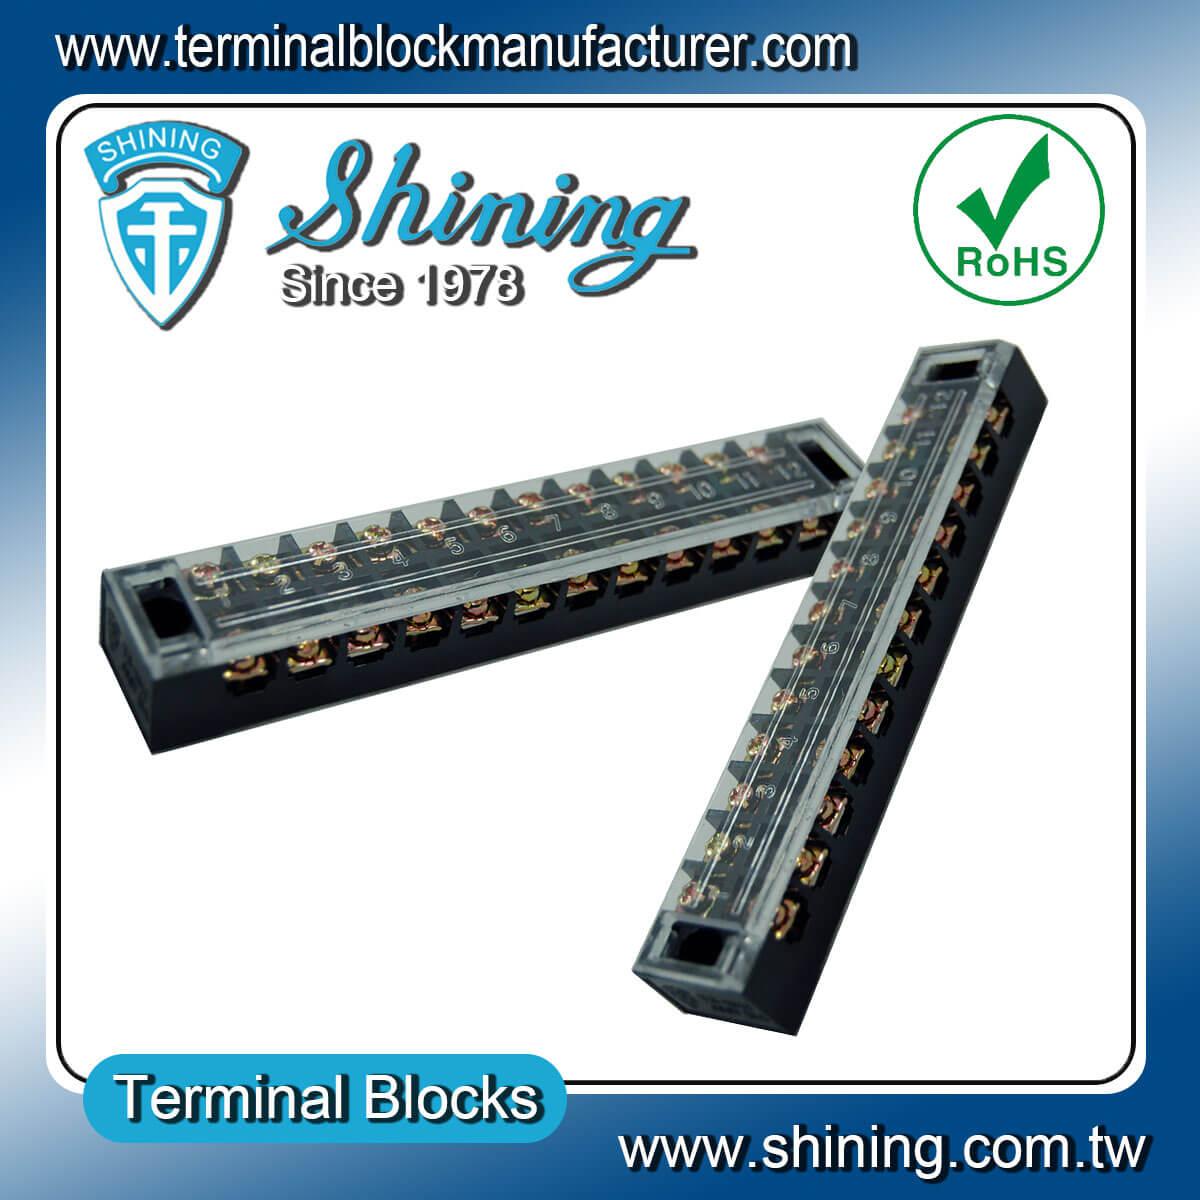 TB-3512 600V 35A 12Pole固定式柵欄端子台